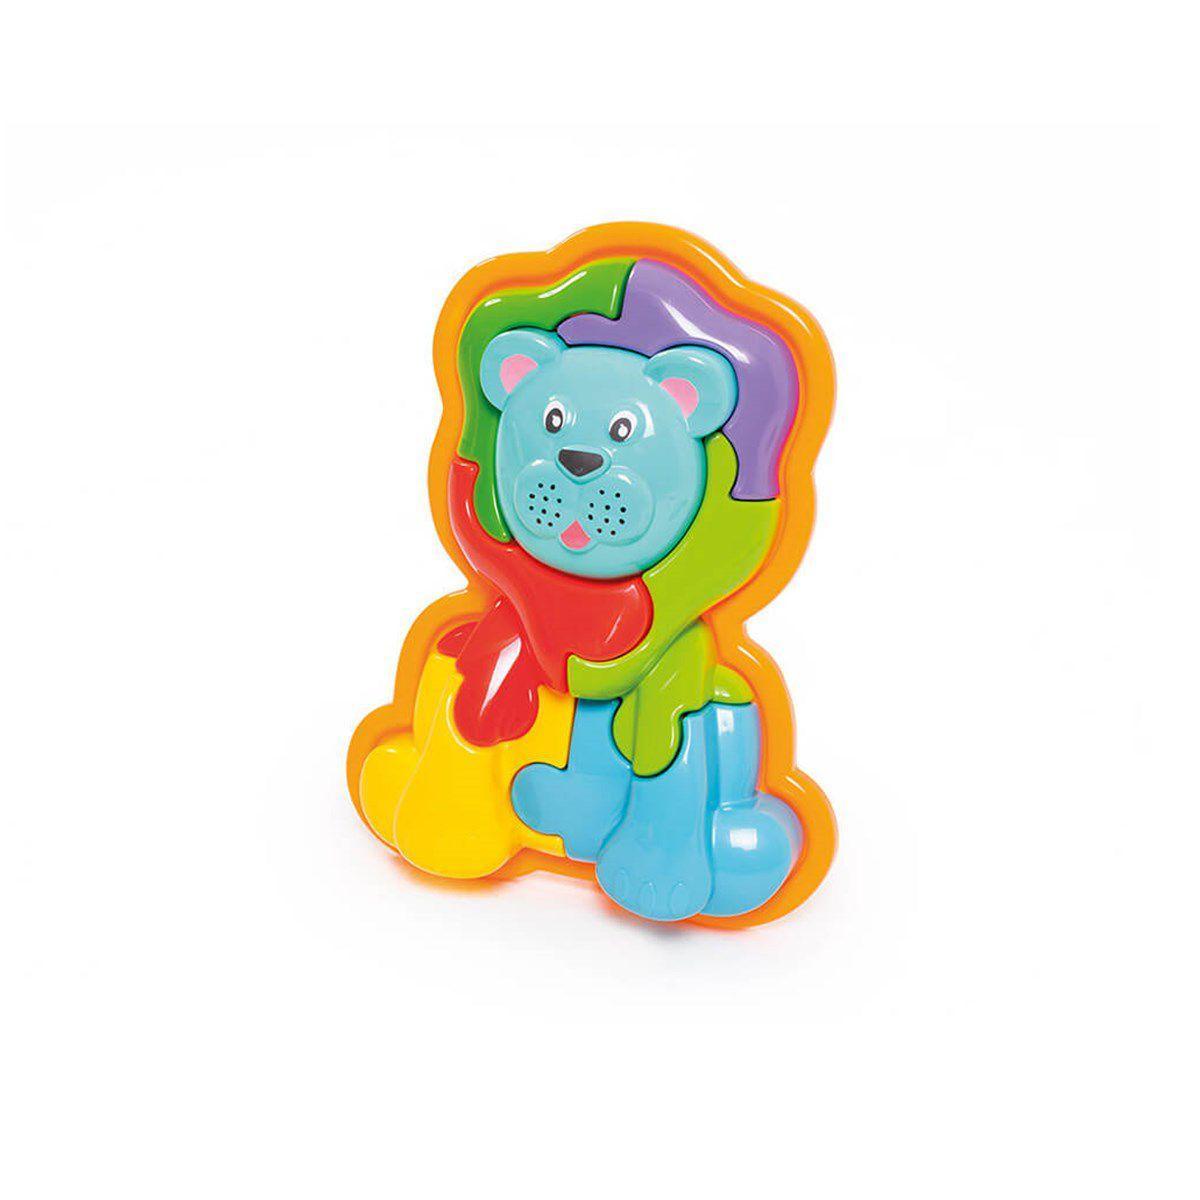 a67d601bead Brinquedo educativo animal puzzle 3d leão - calesita 853 R  39